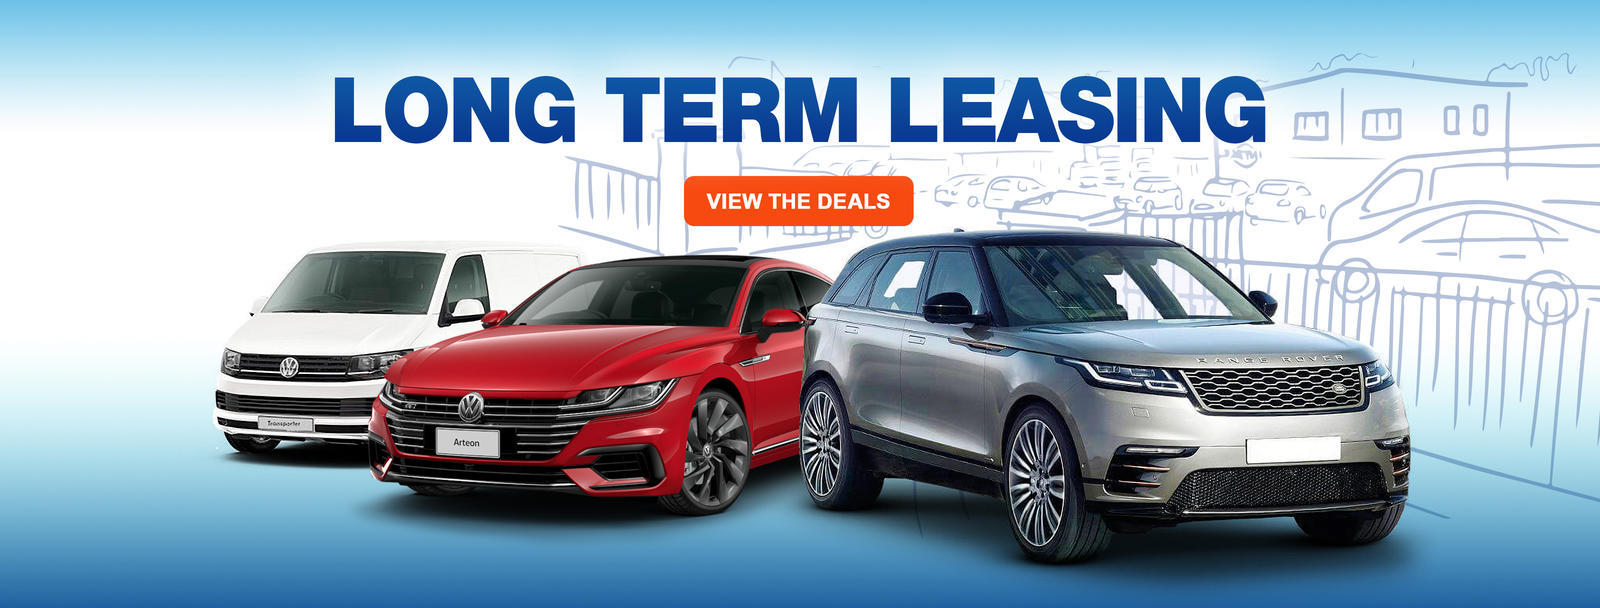 Short Term Car Leasing Cheap Car Leasing For Short Term Buy Now